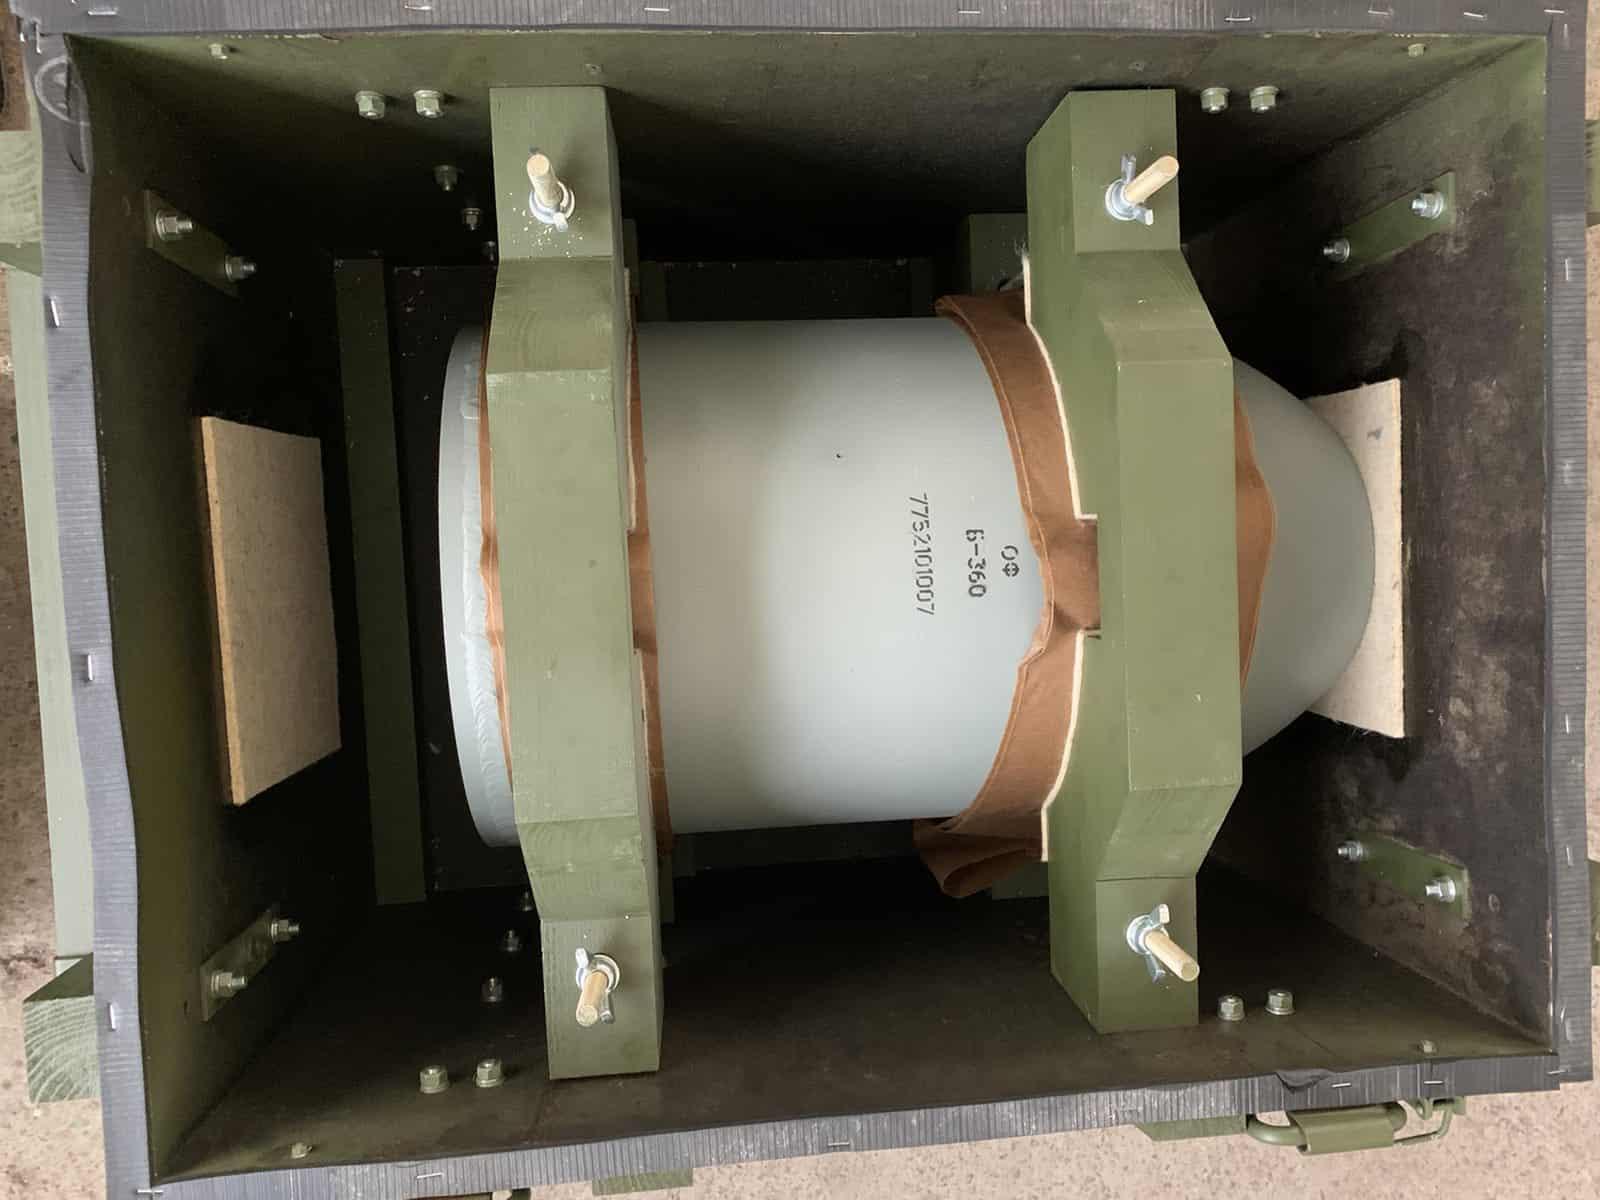 Бойова частина ракети Р-360 комплексу «Нептун»